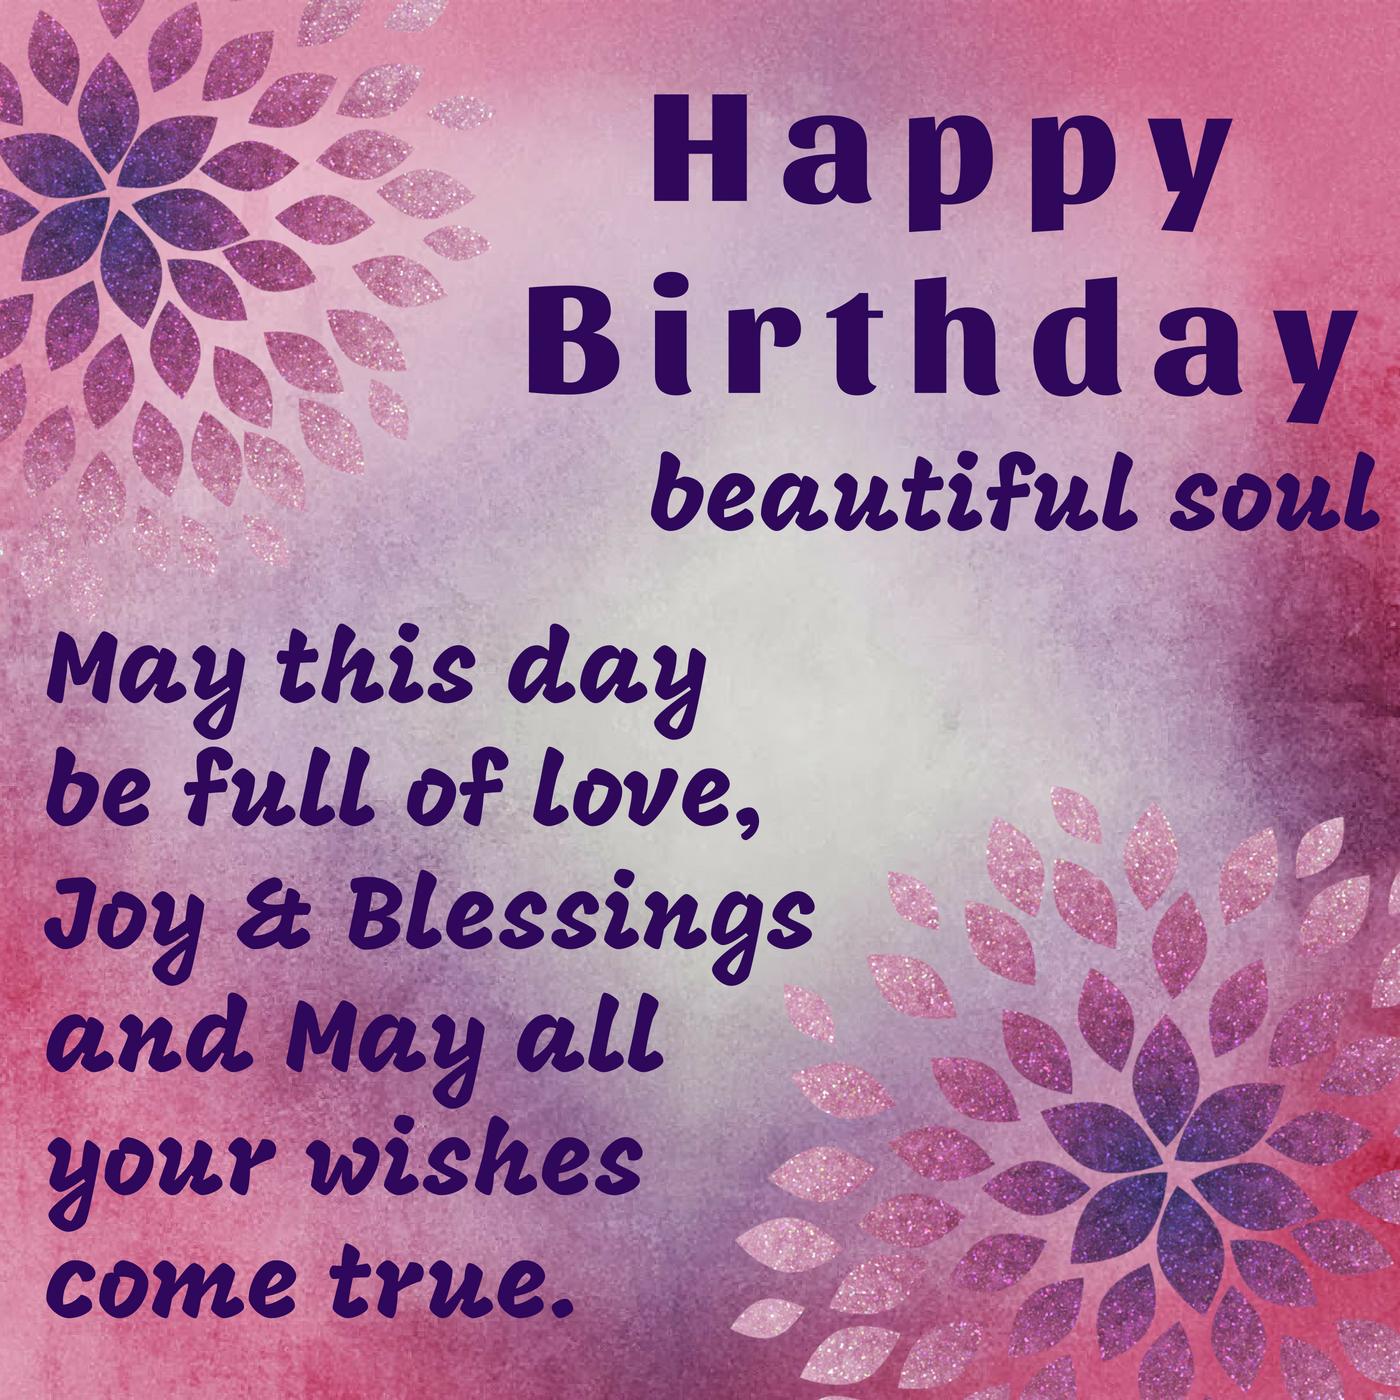 happybirthday #birthdaywishes #beautifulsoul  Birthday wishes for